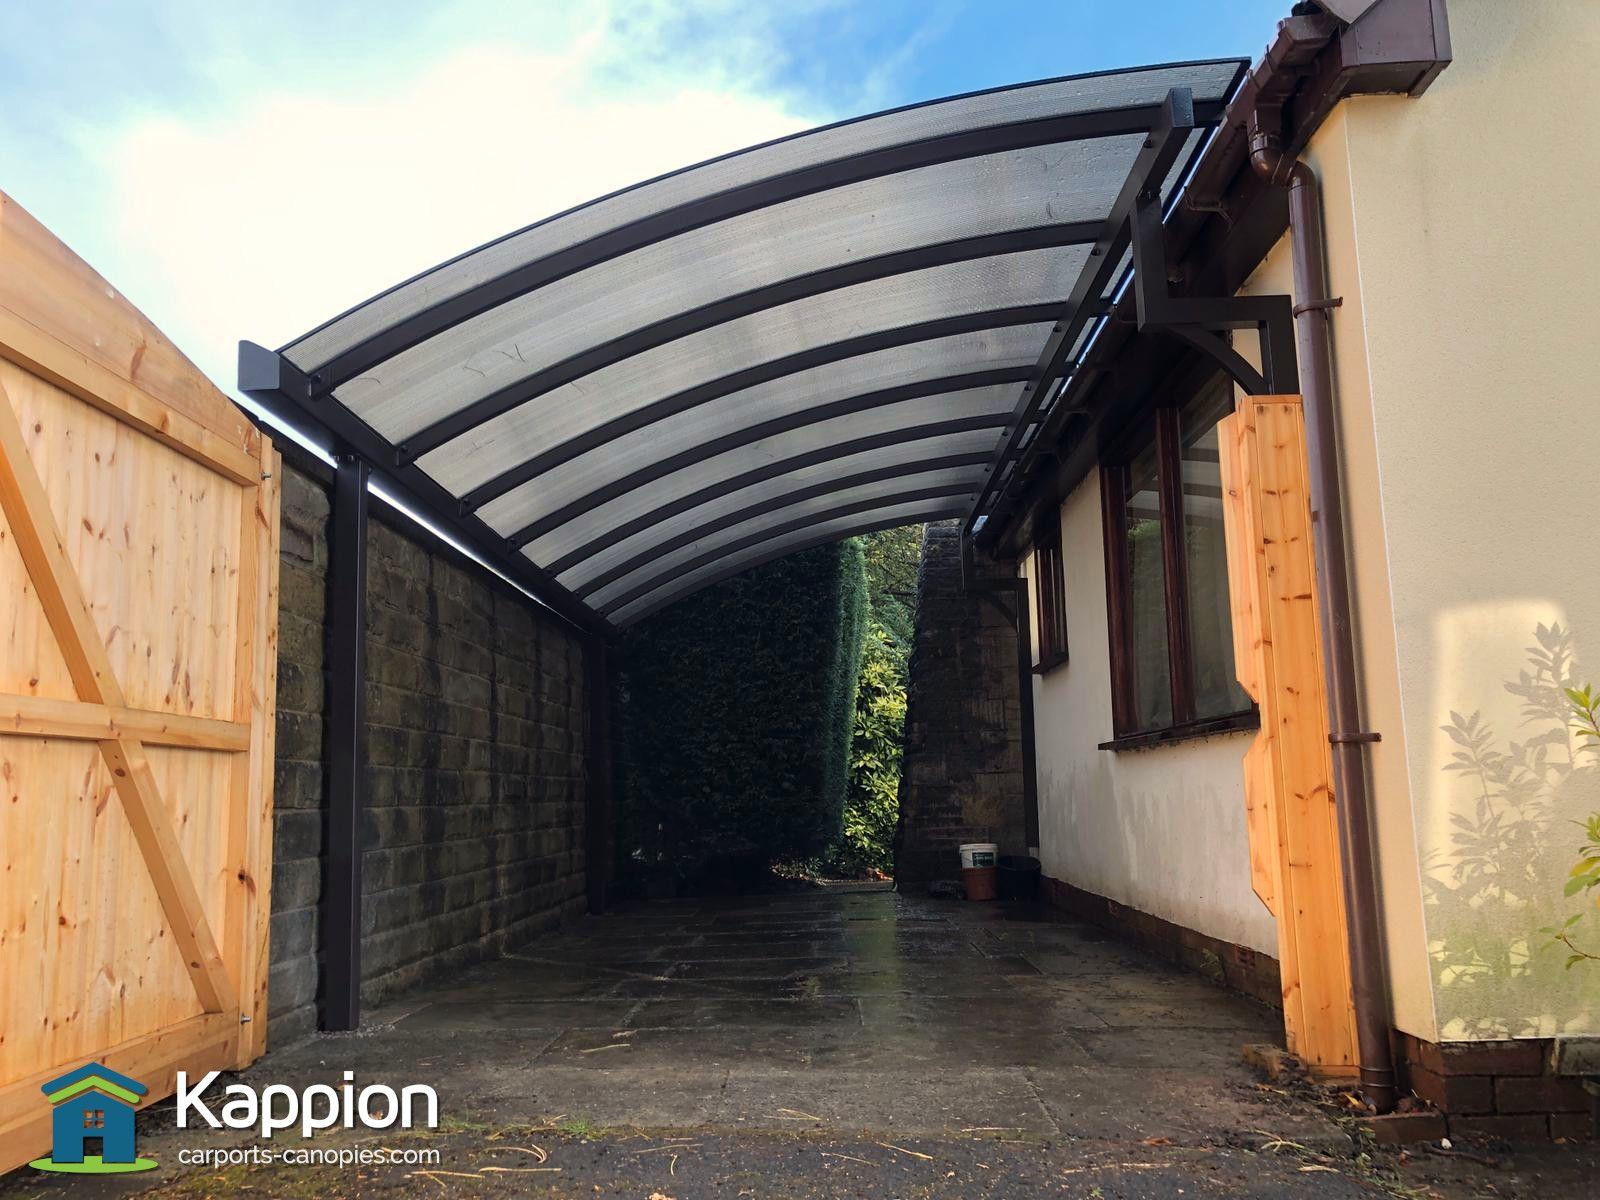 Handmade Carports & Canopies Carport canopy